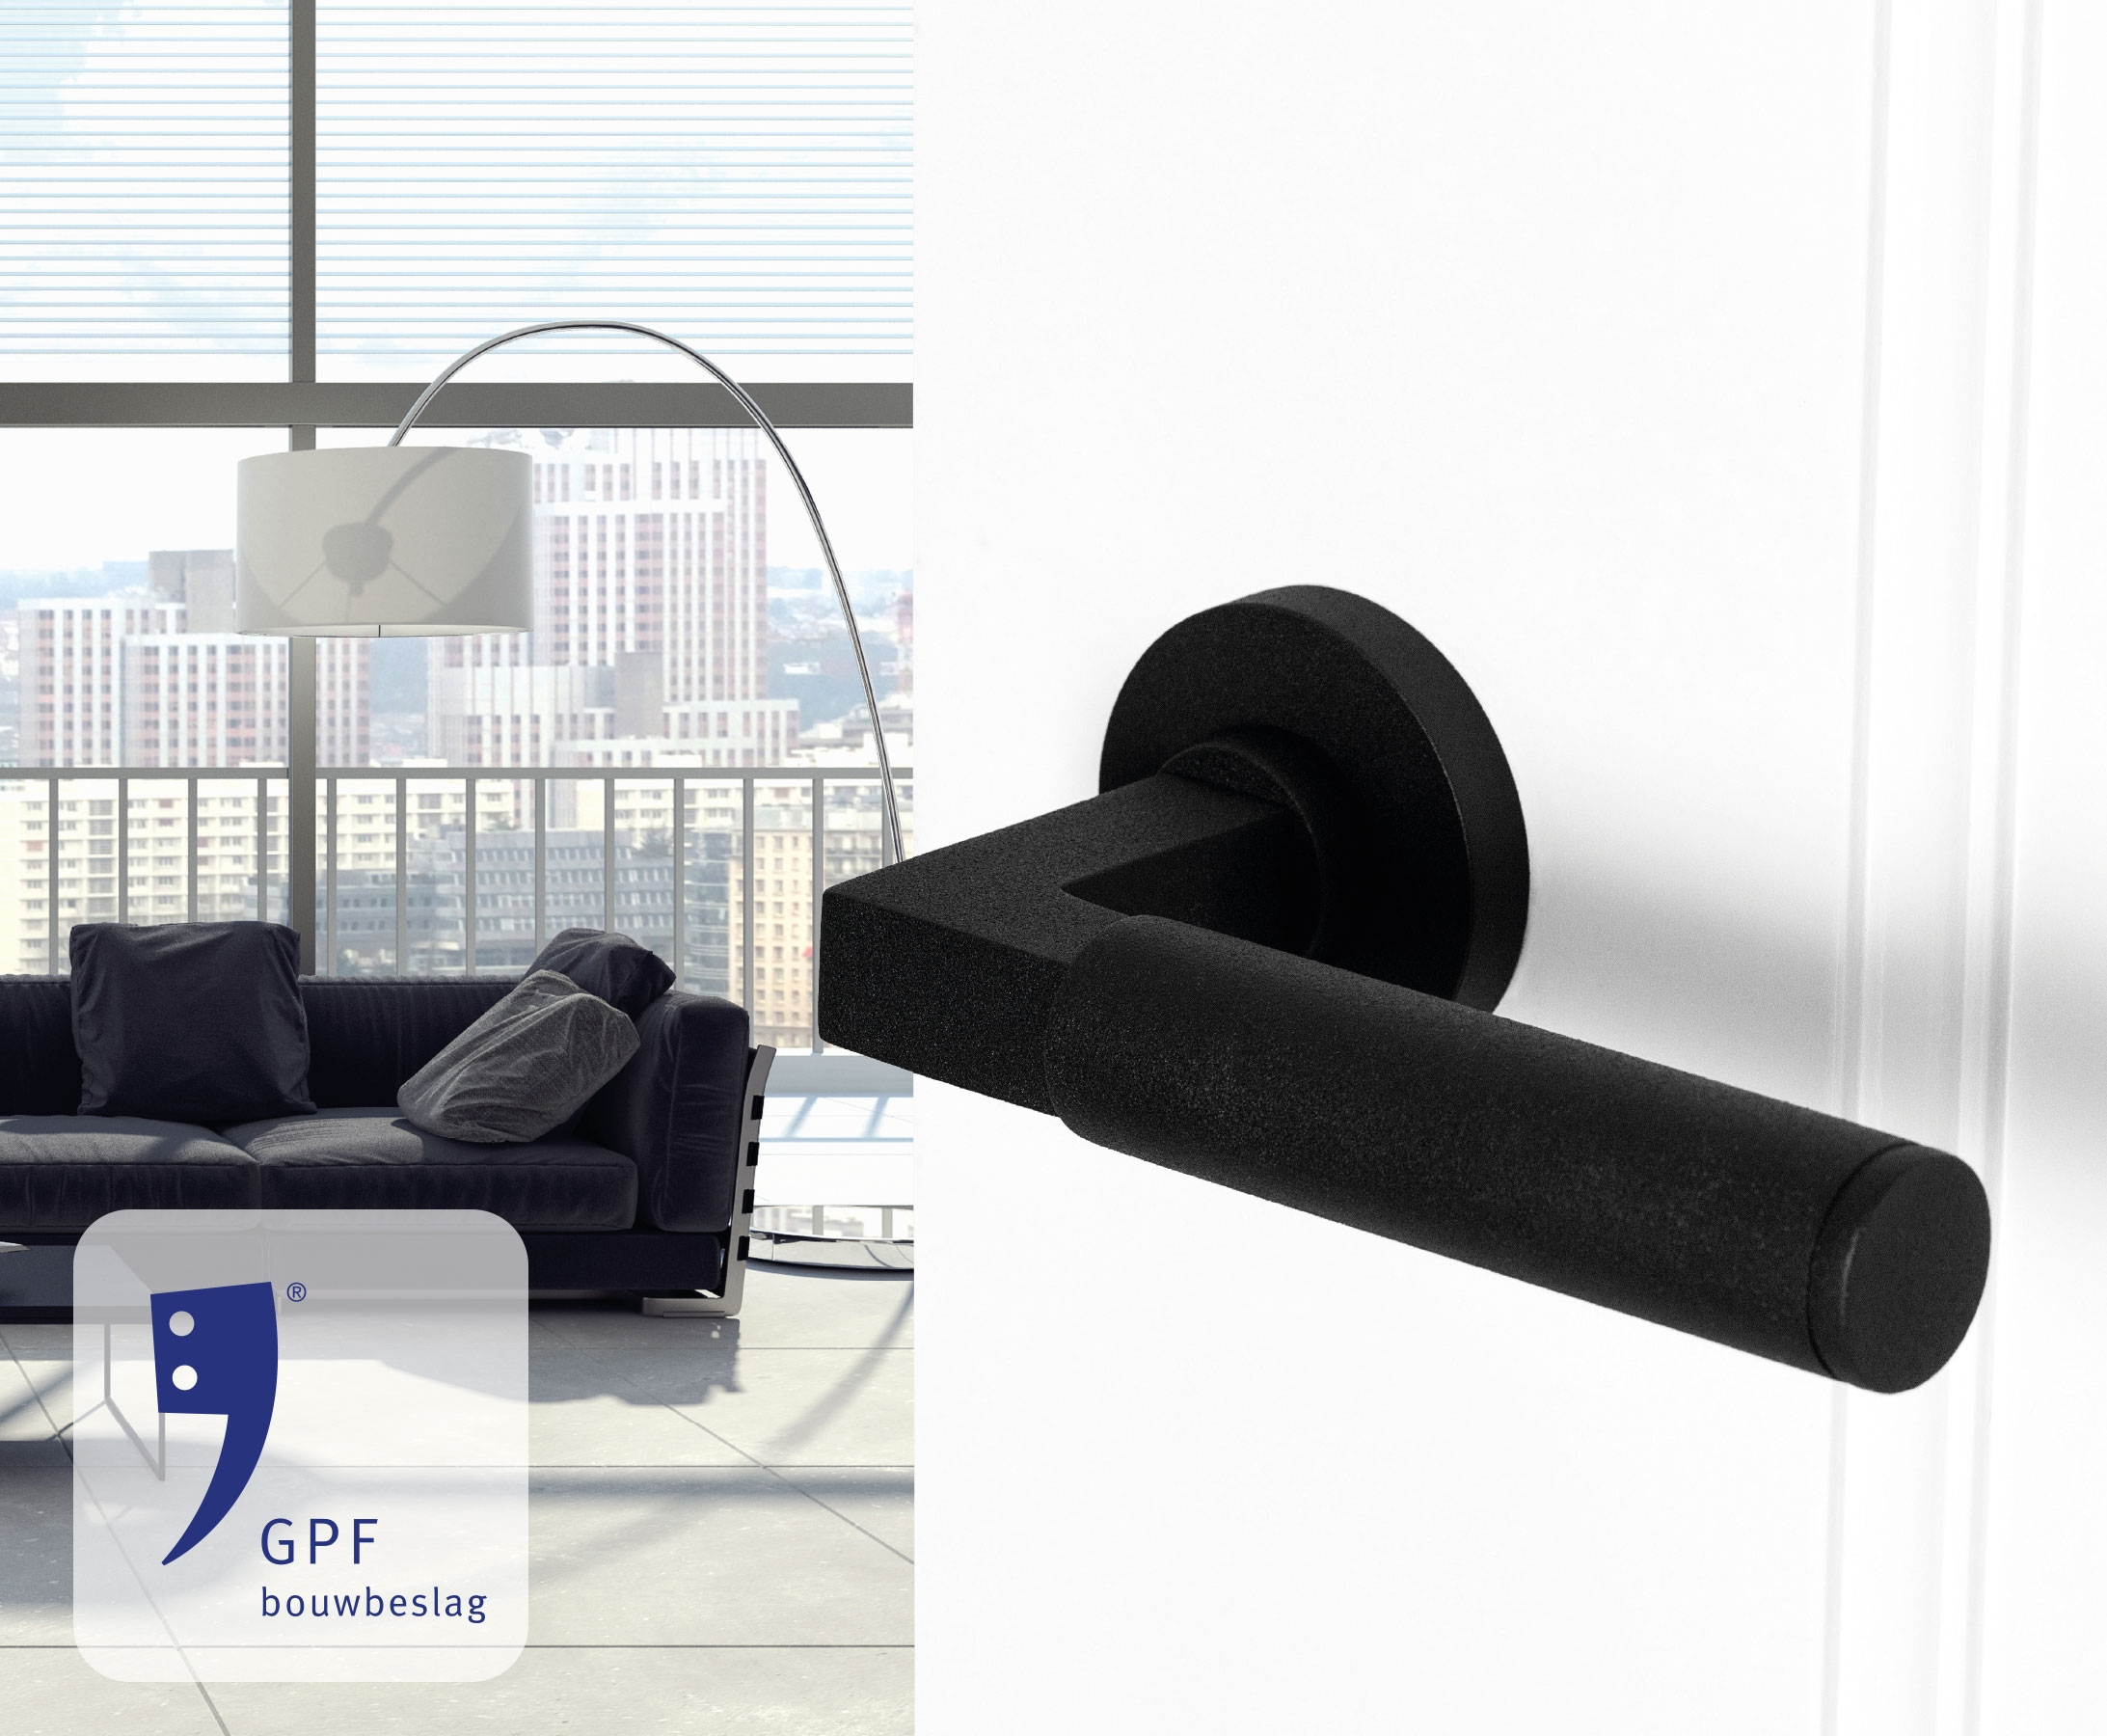 GPF bouwbeslag finish zwart sfeerafbeelding